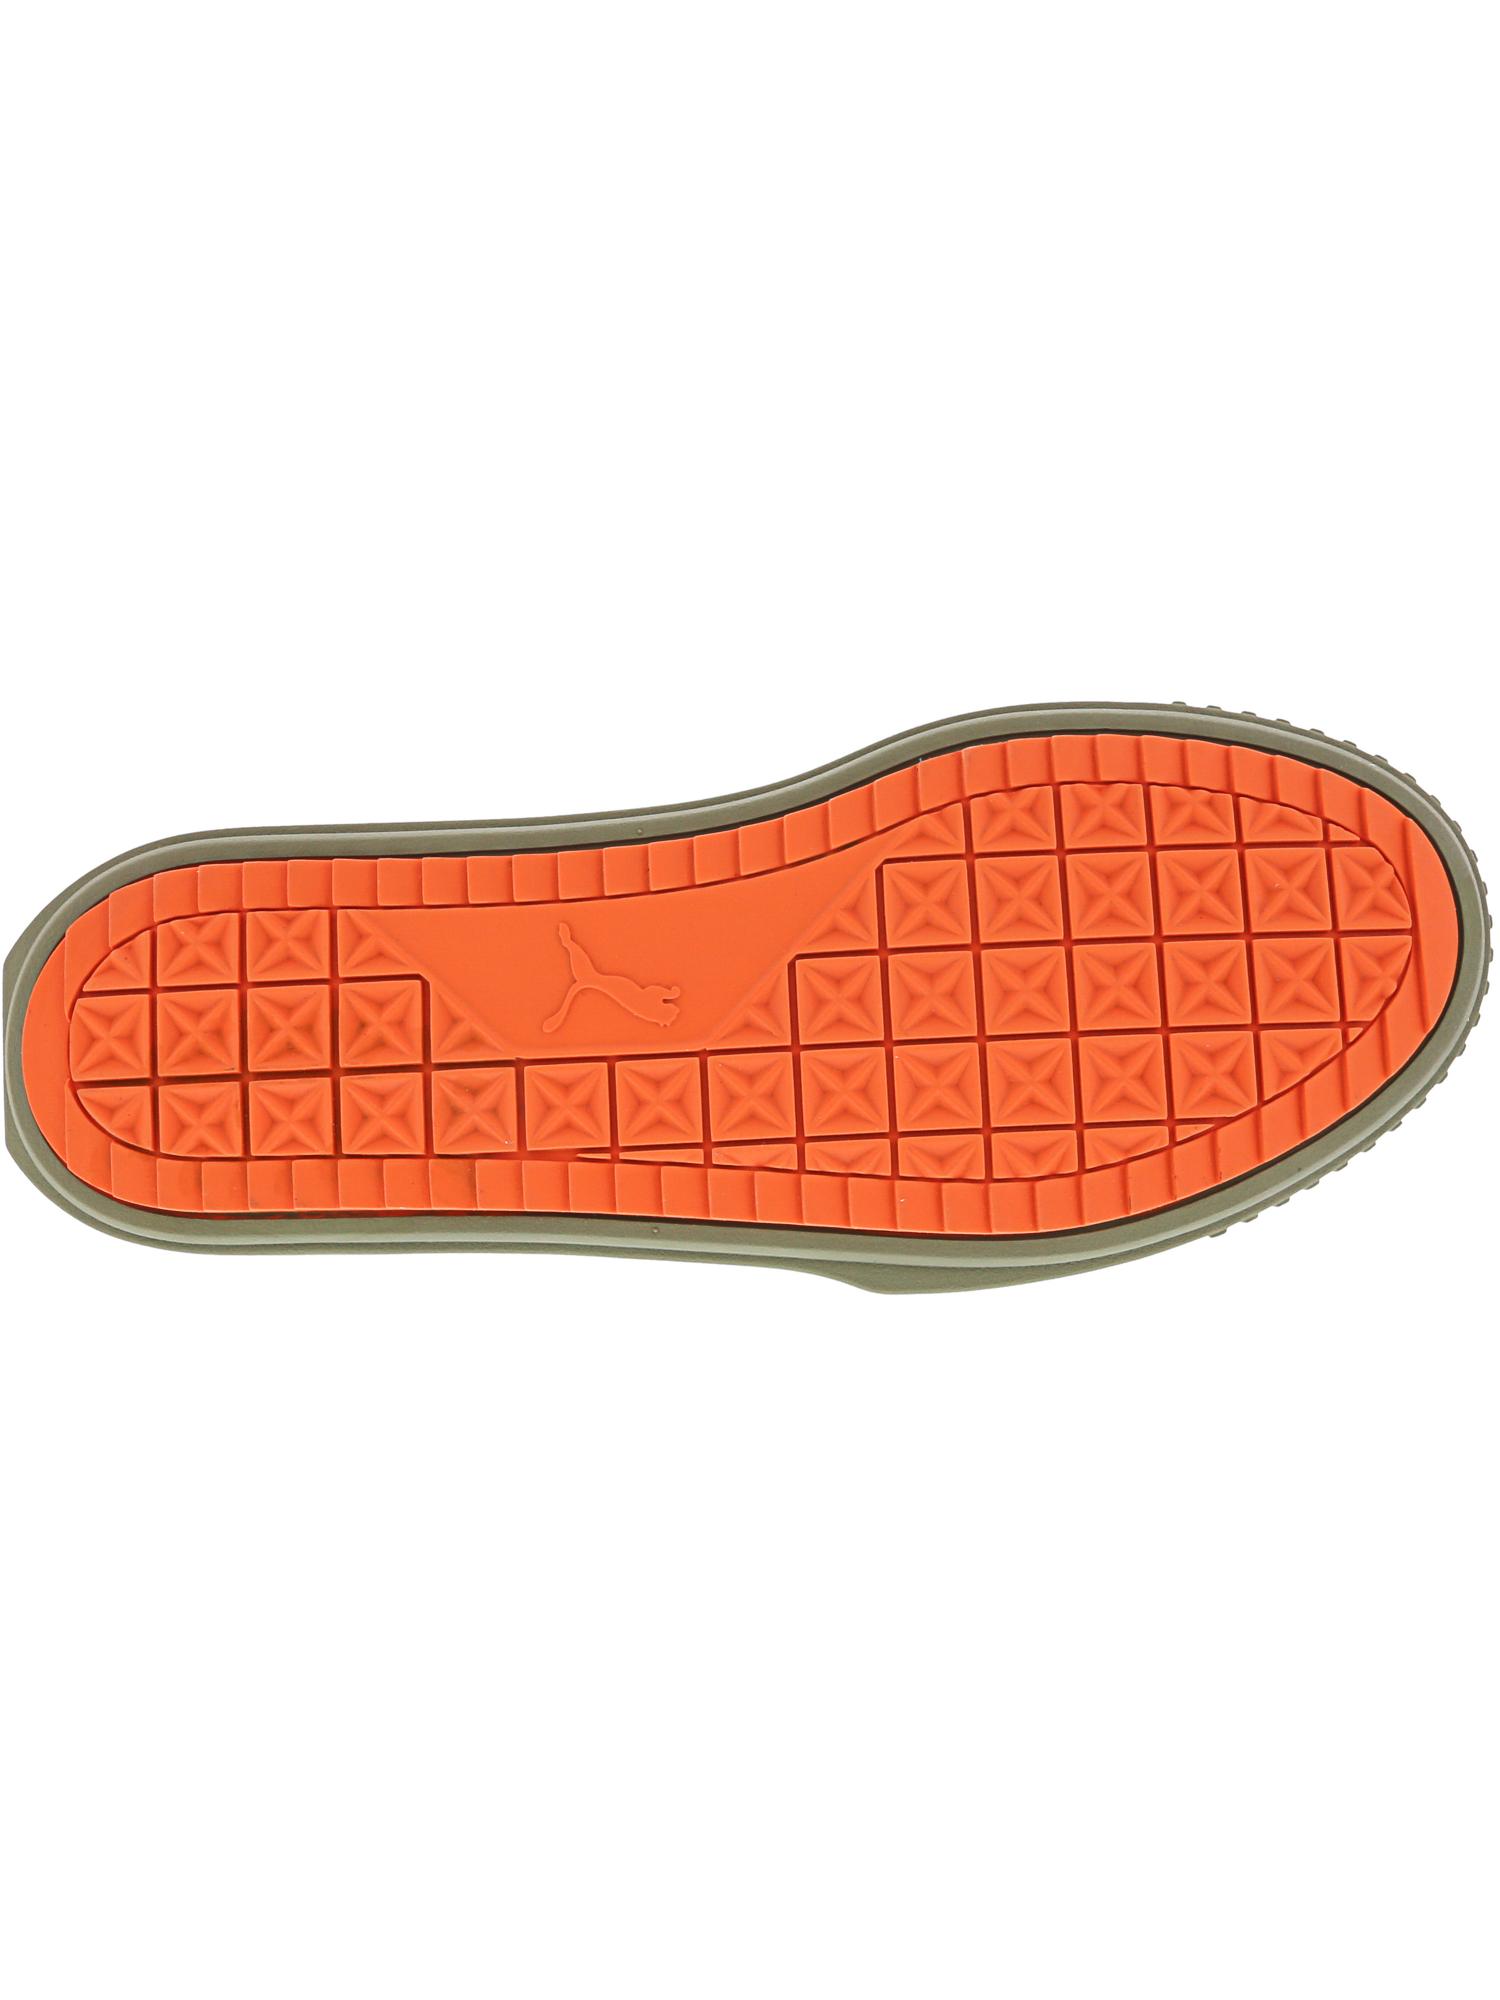 5348ff7230f8 Puma Men s Breaker Mesh FOF Ankle-High Leather Fashion Sneaker